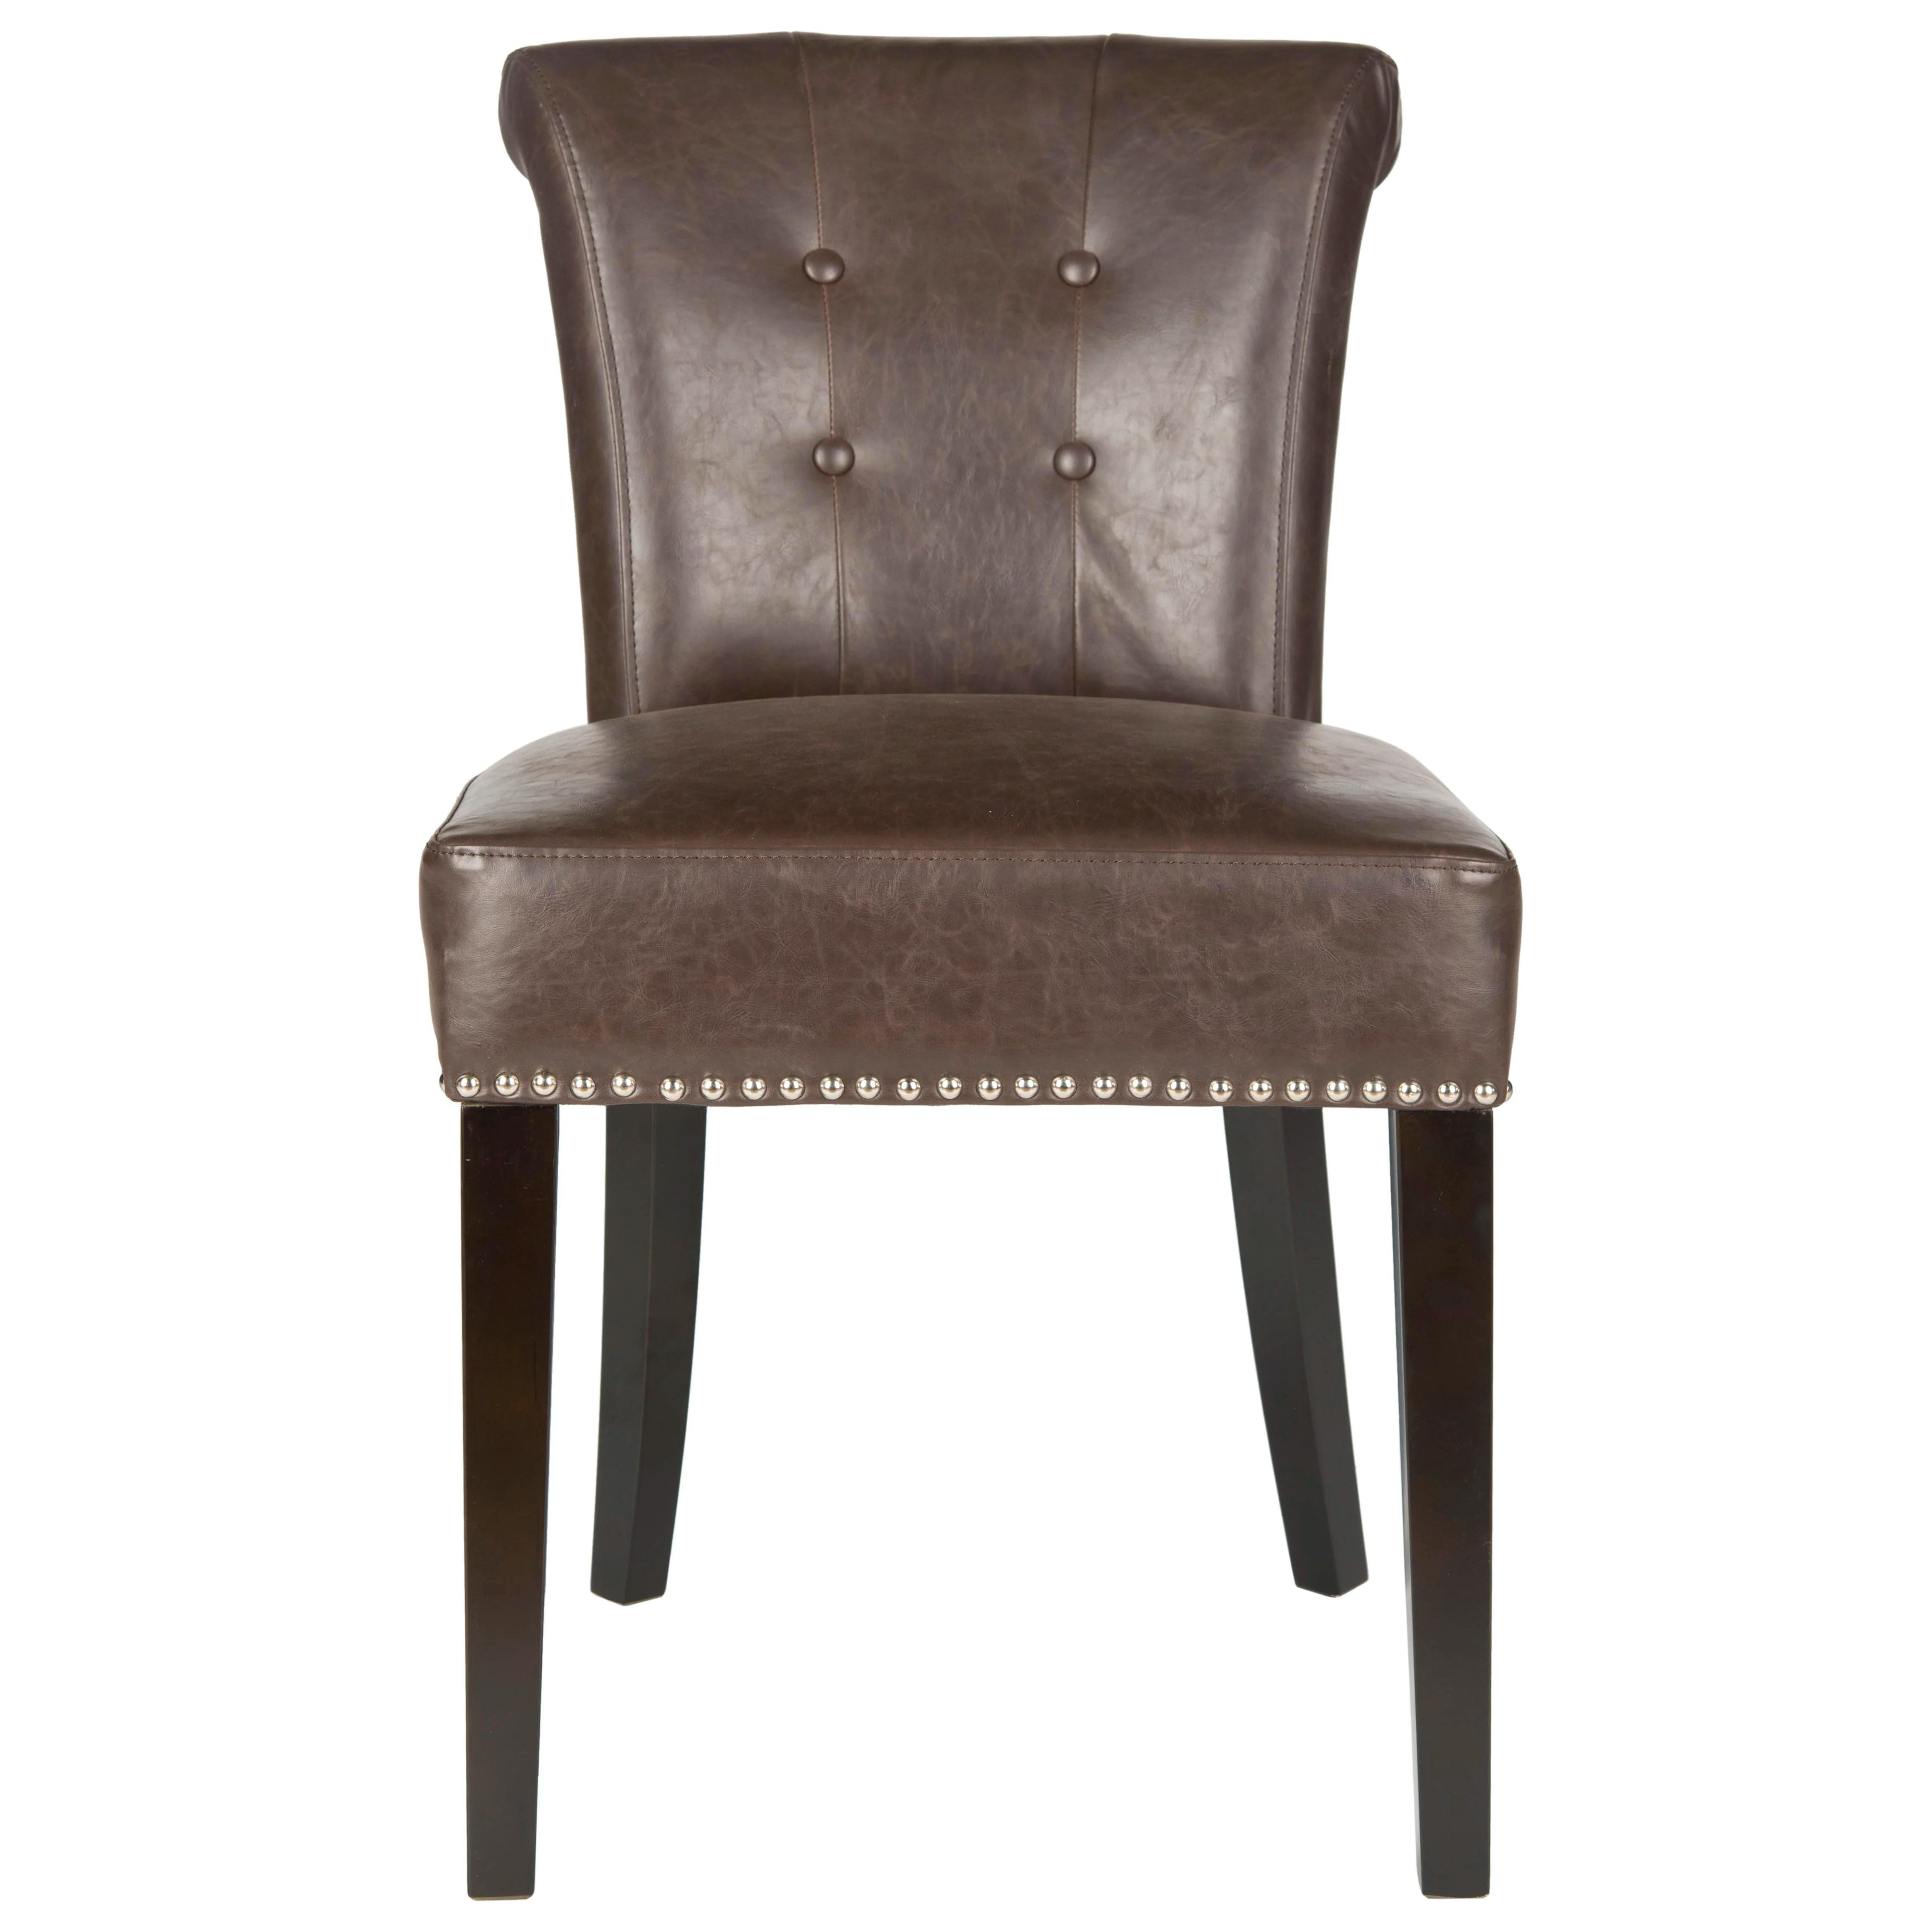 safavieh sinclair ring side chair wicker and ottoman set parsons reviews wayfair